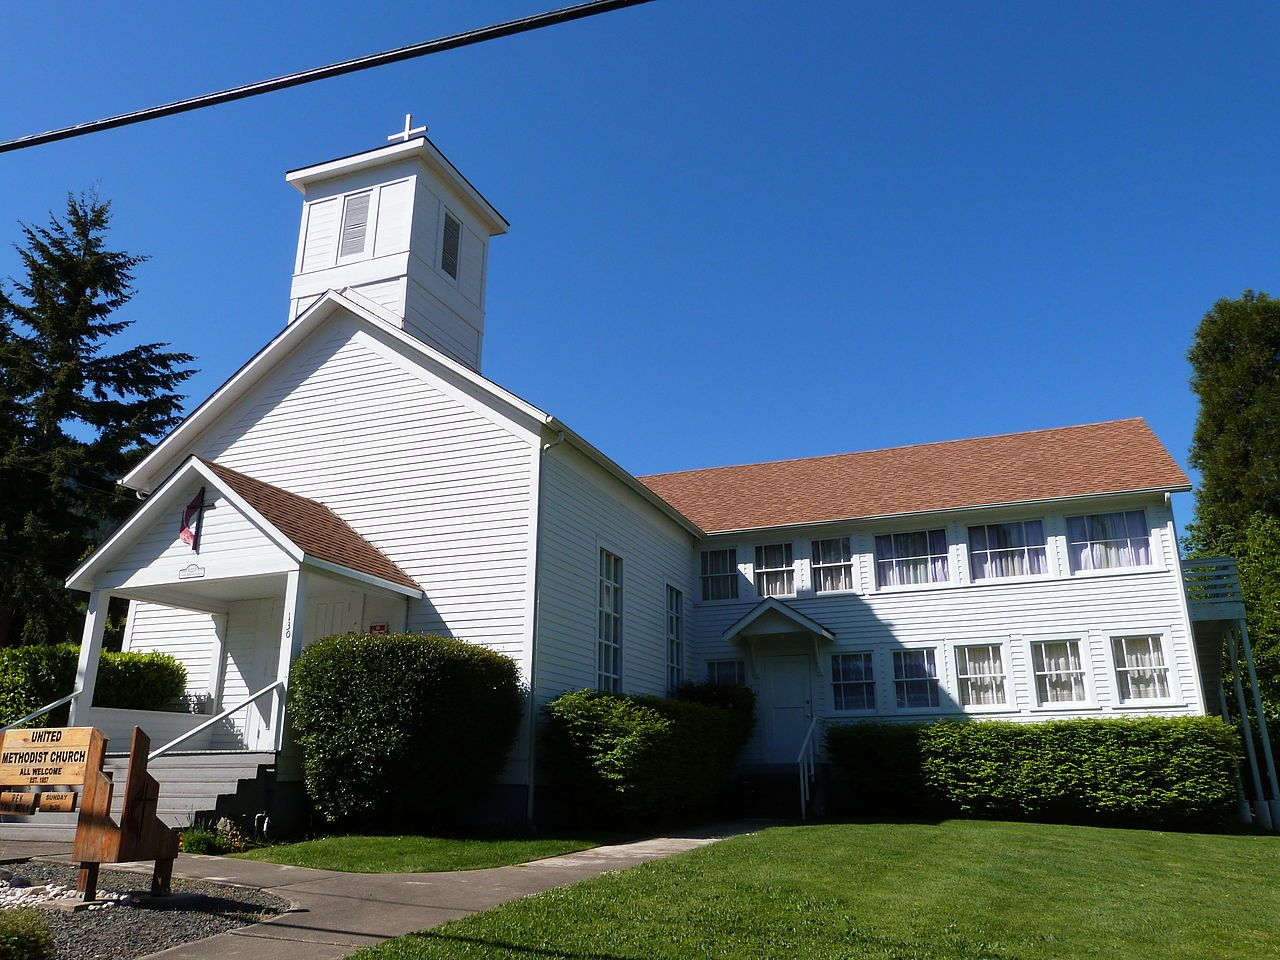 Canyonville methodist church in douglas county oregon